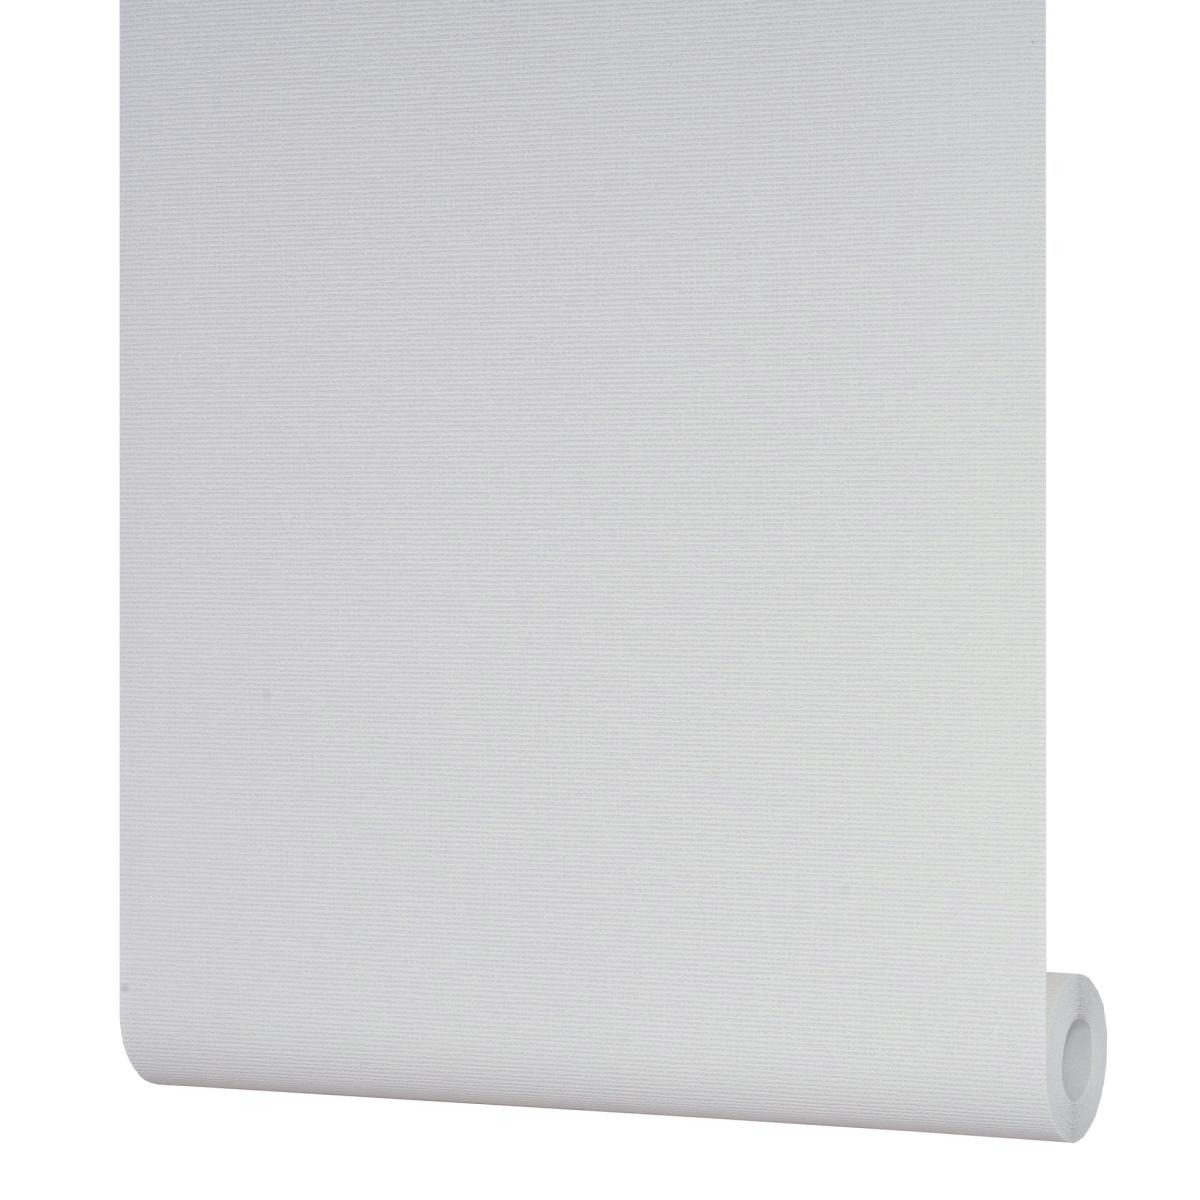 Обои флизелиновые A.S. Création Tapeten Ag Balade серые 376099 0.53 м